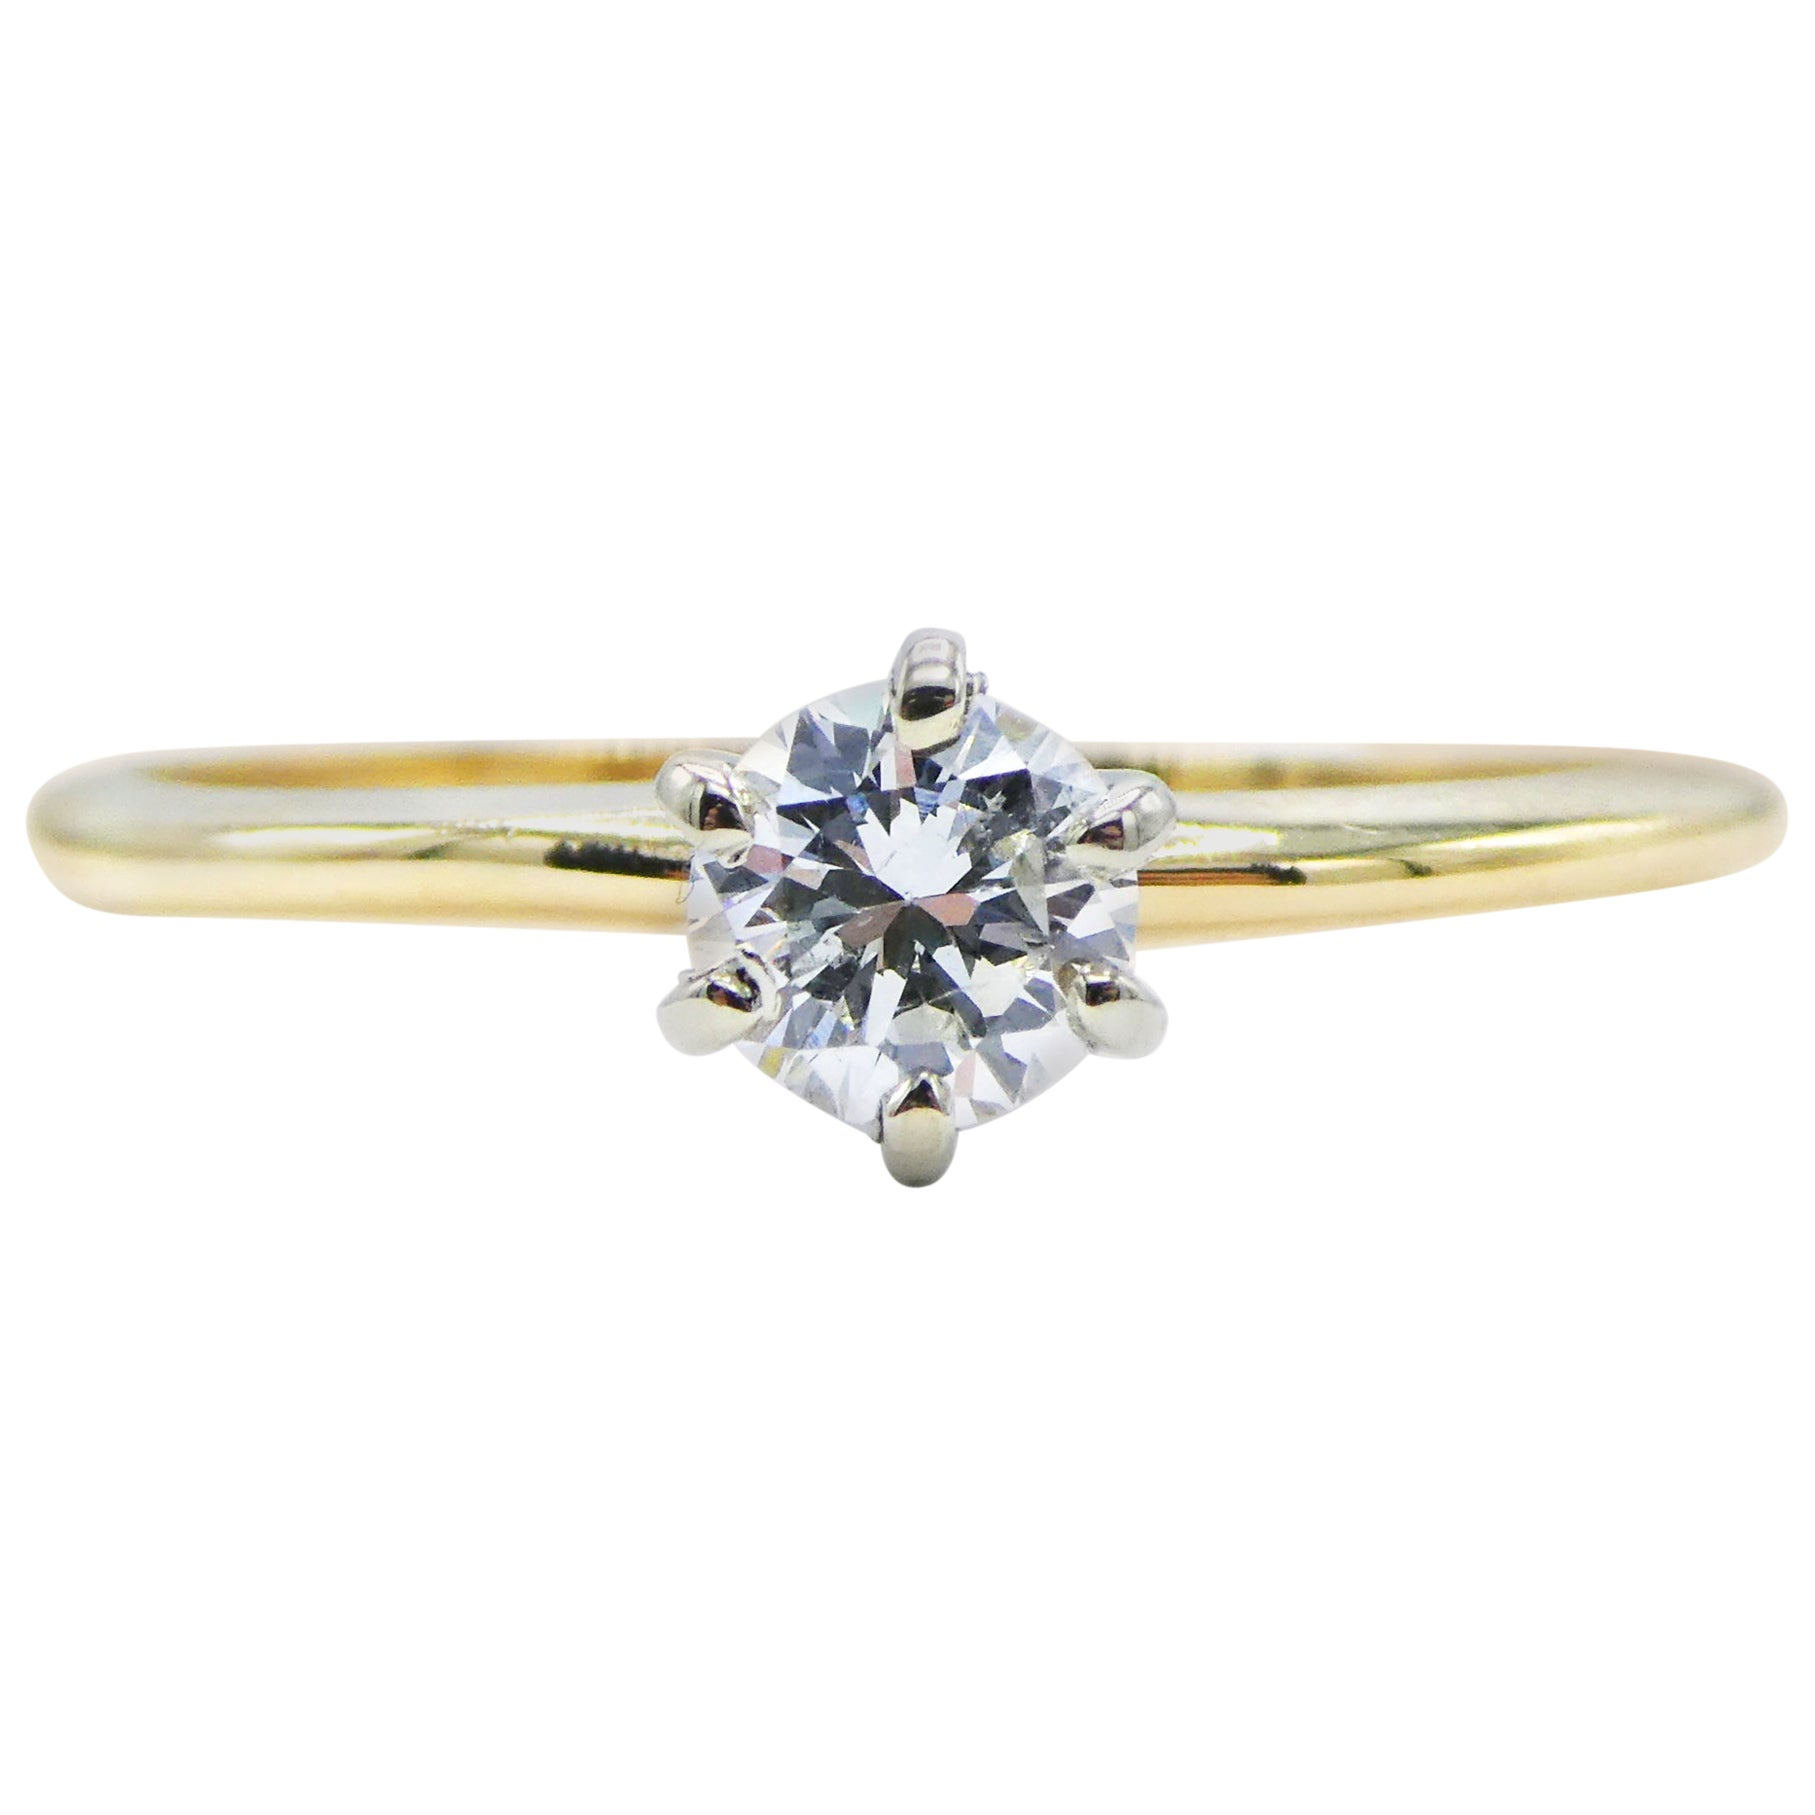 14 Karat Yellow Gold 0.25 Carat Round Brilliant Cut Diamond Solitaire Ring